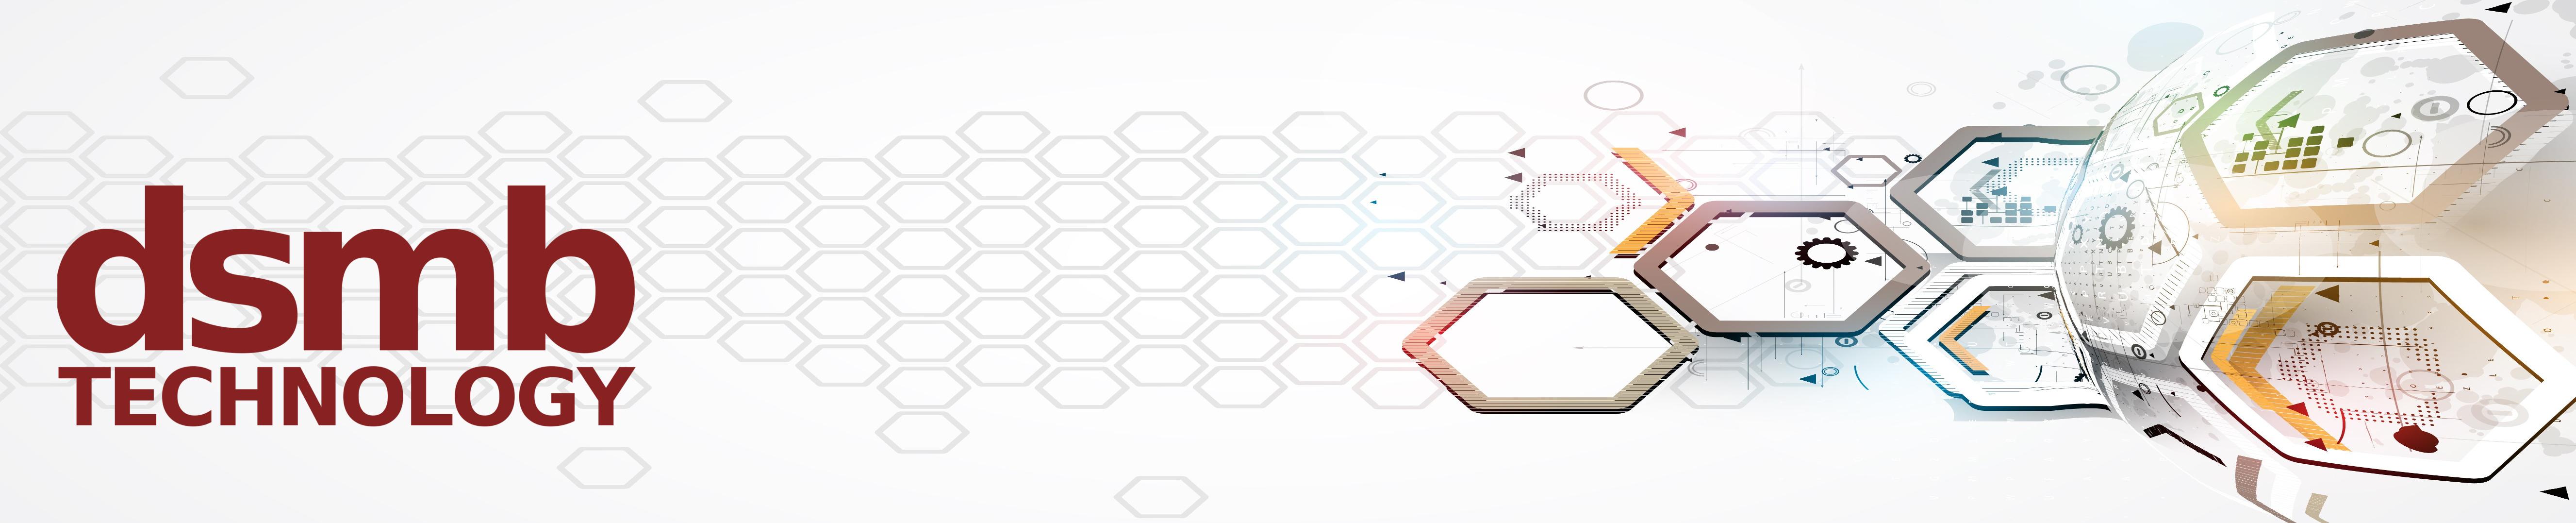 DSMB Technology